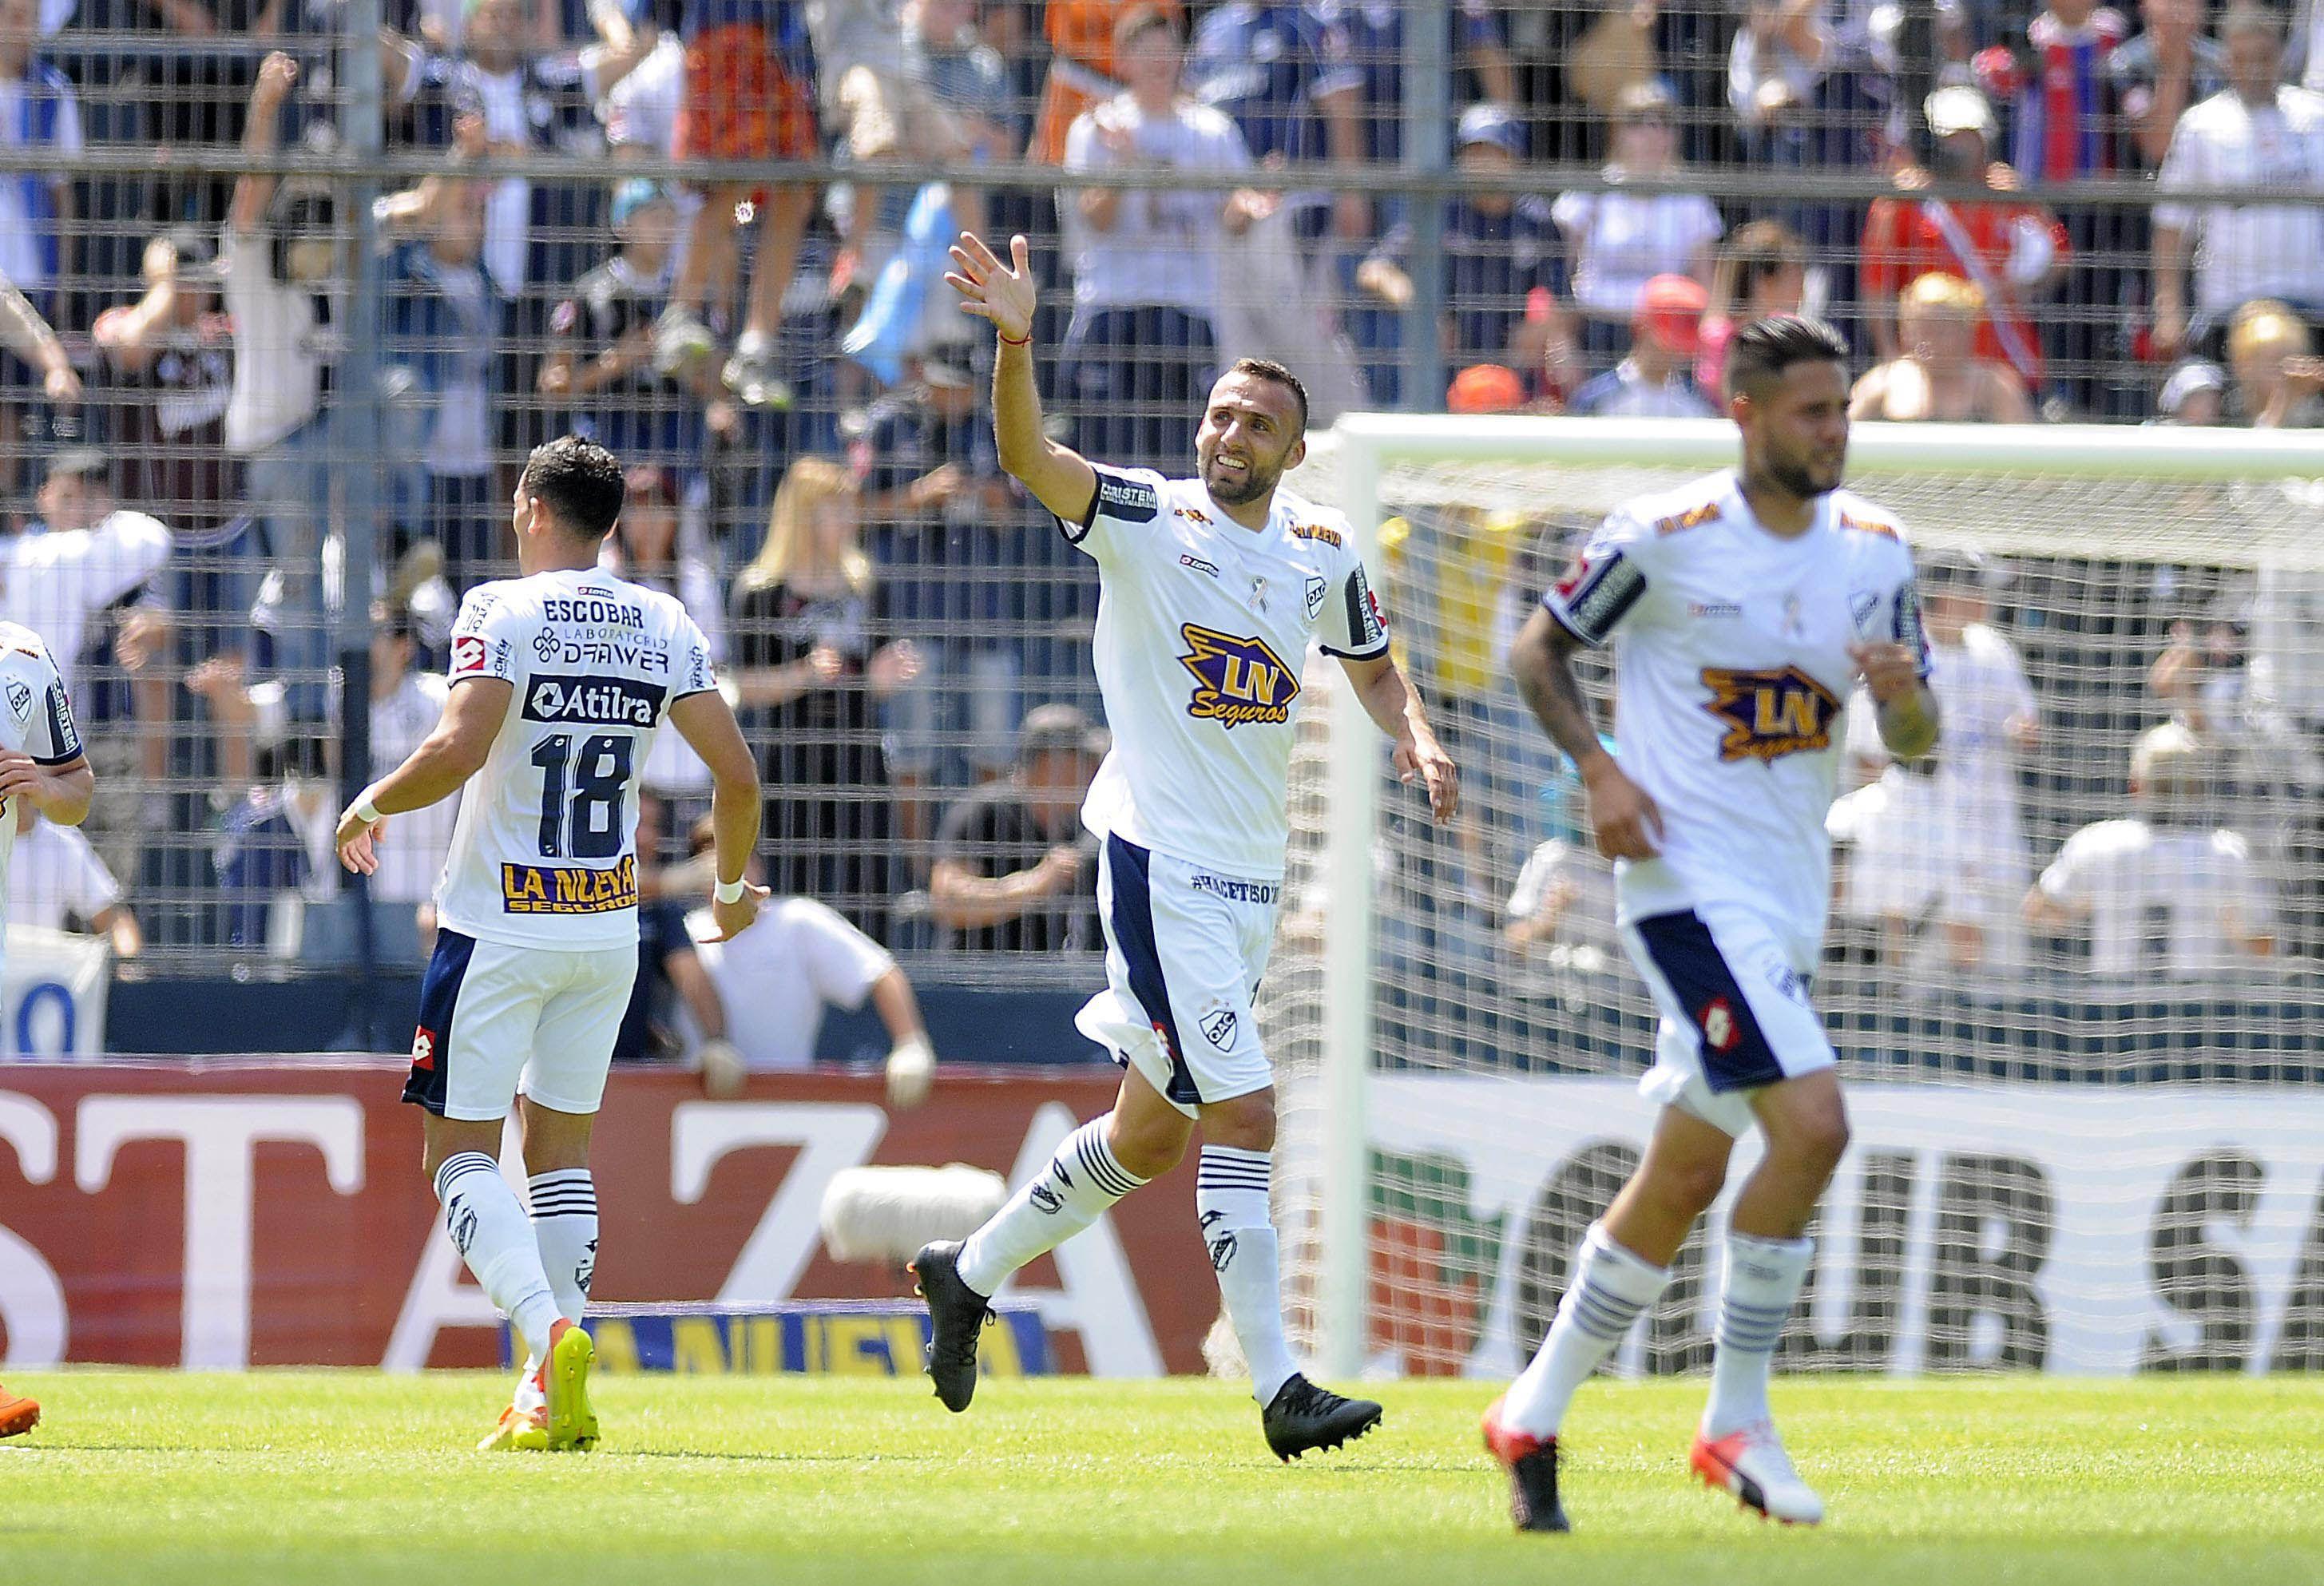 Quilmes celebra el gol de Botiino ante Lanús